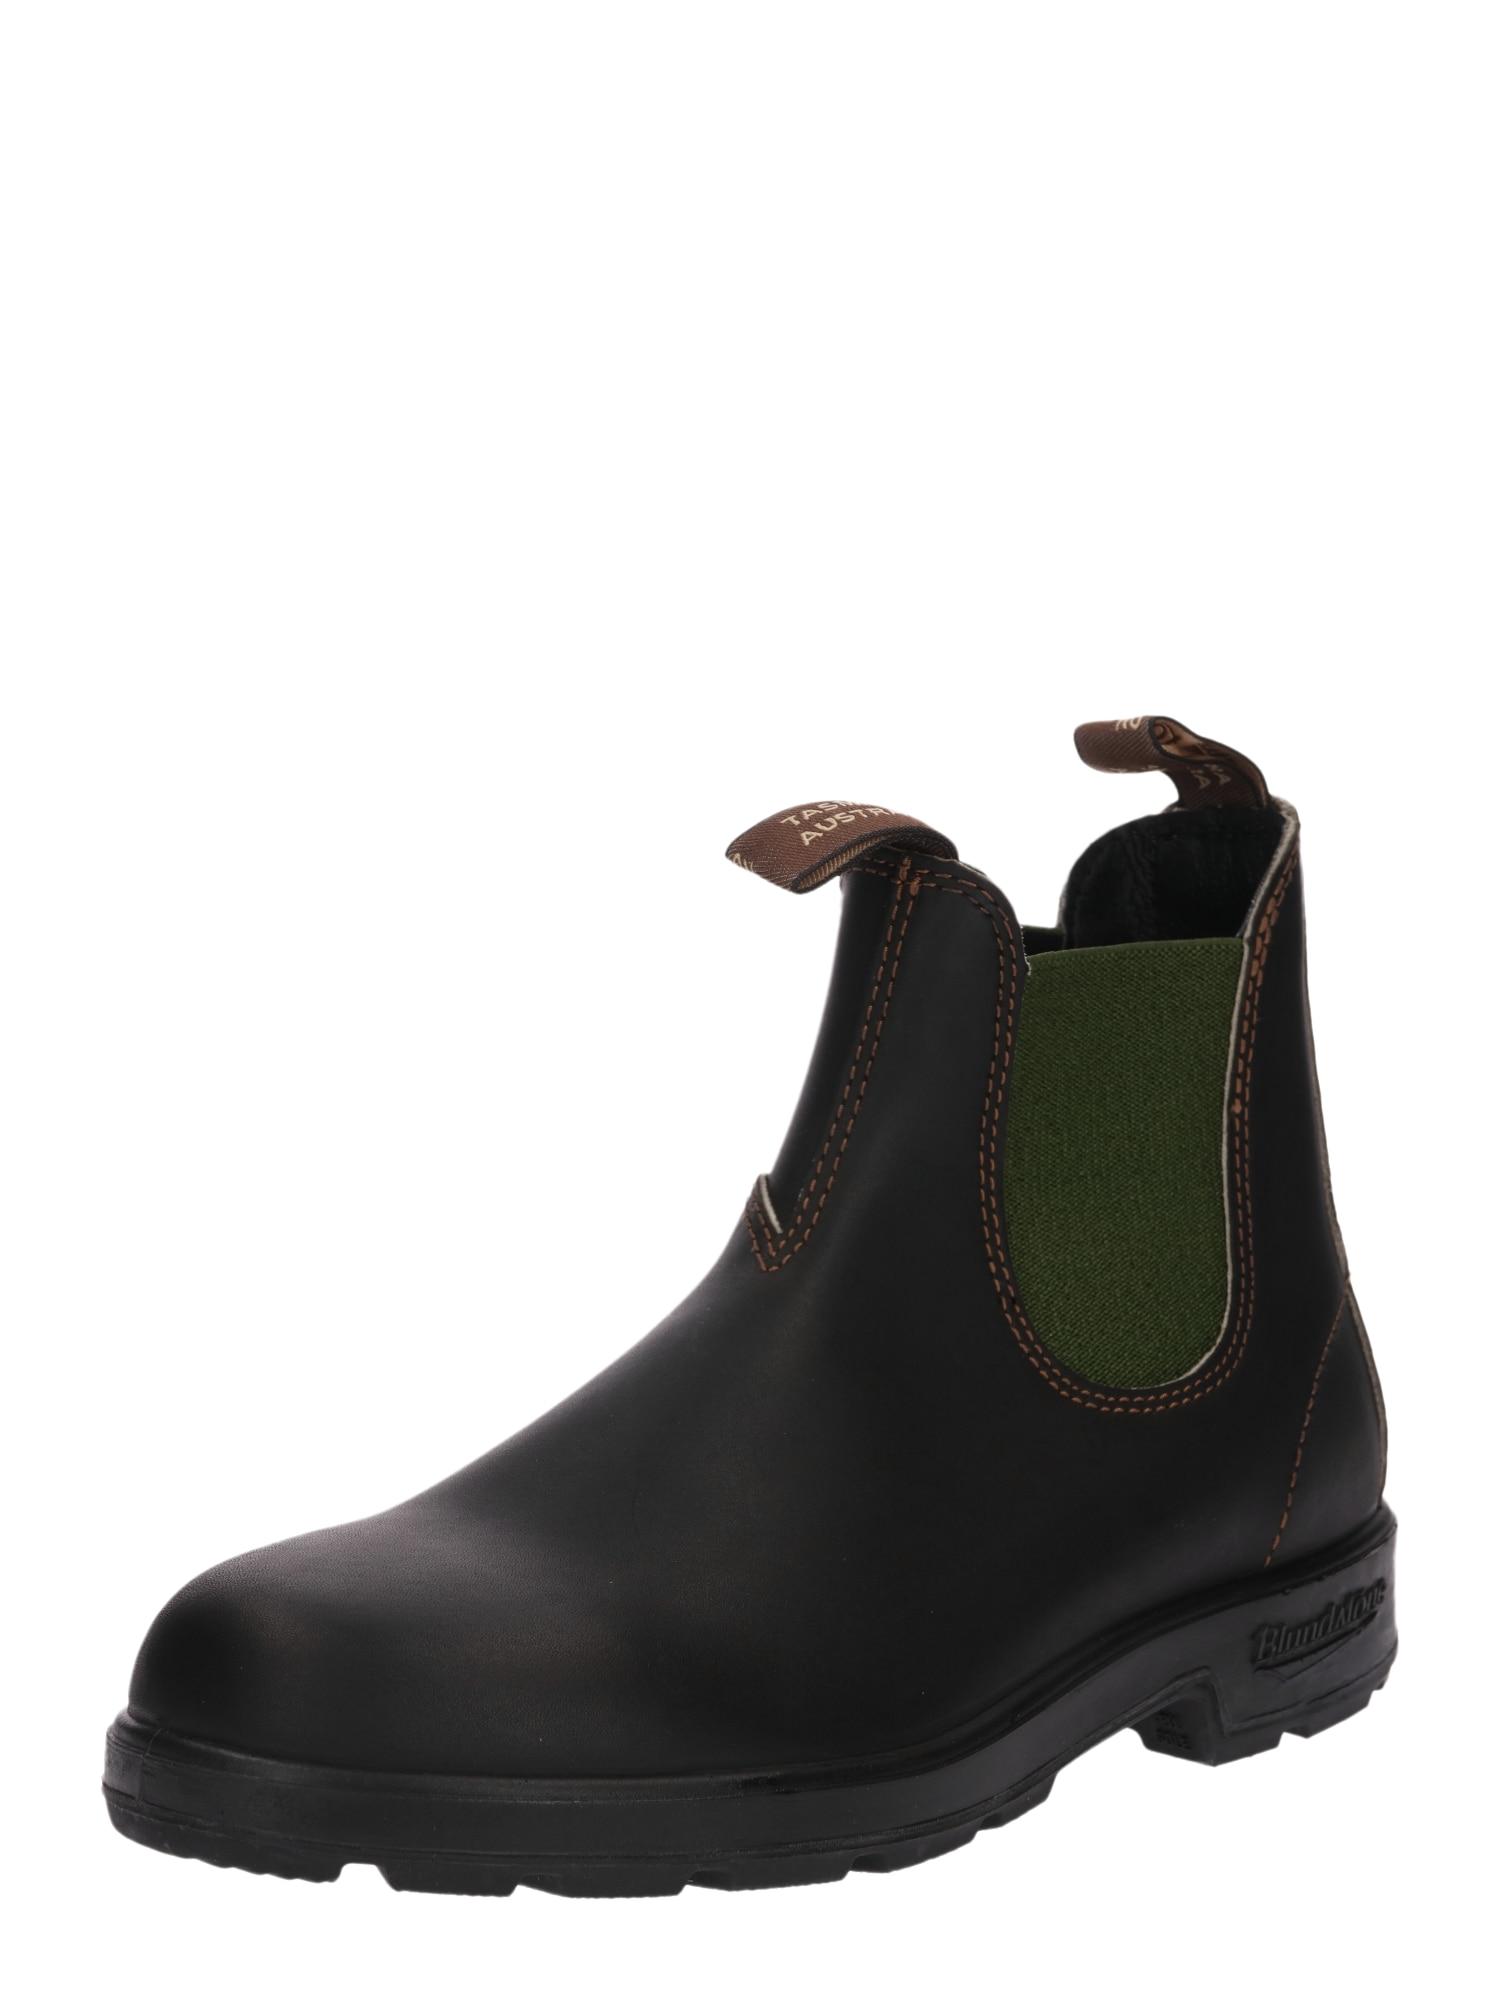 Blundstone Chelsea batai tamsiai ruda / žalia